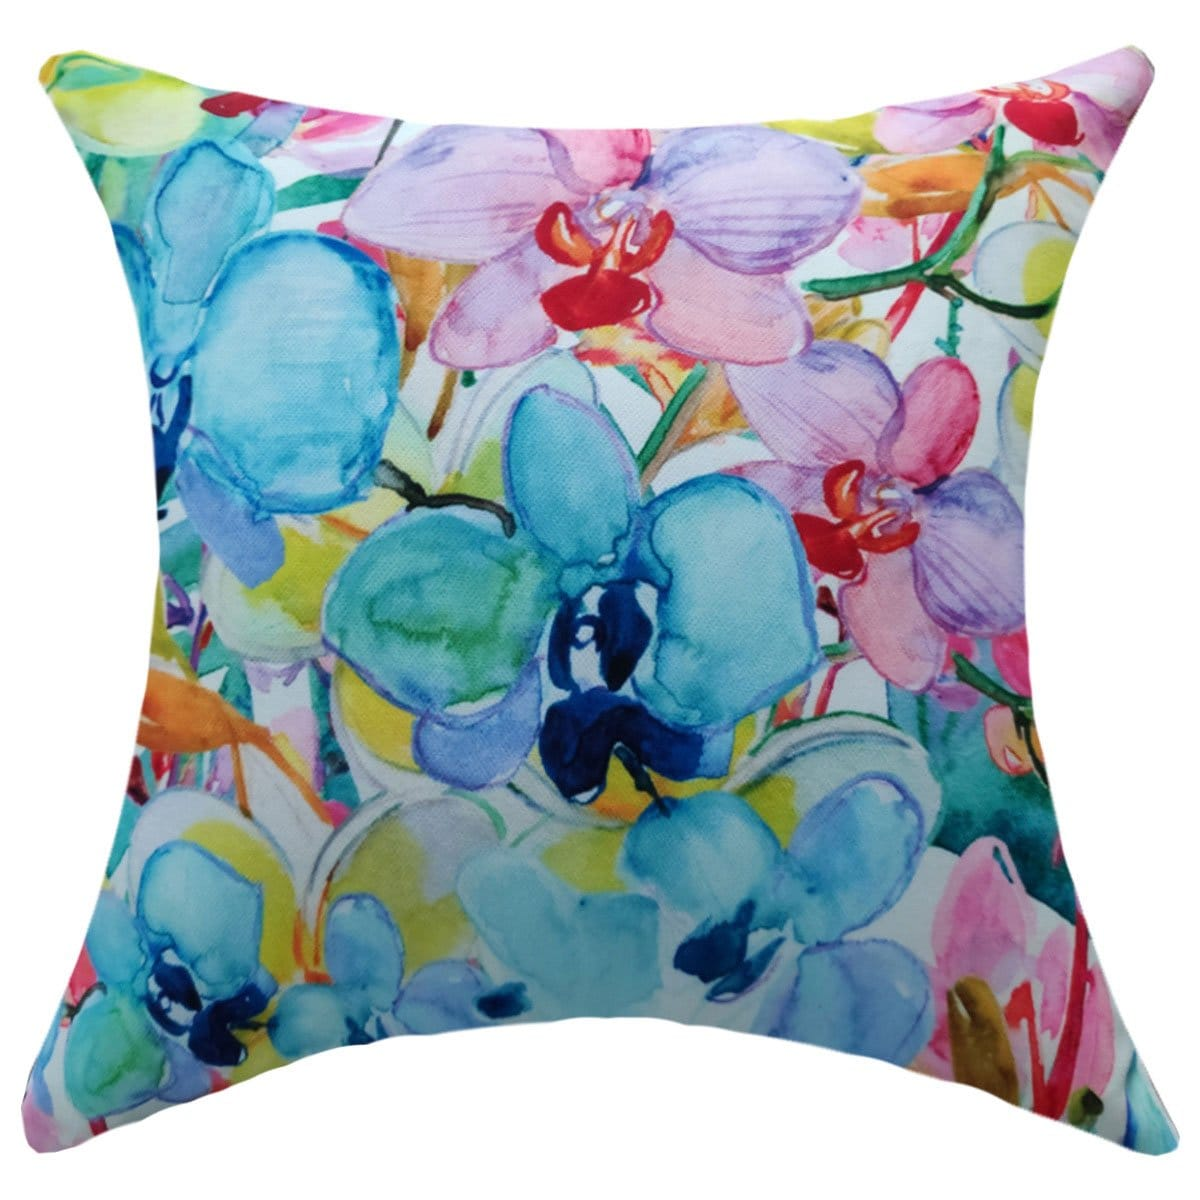 Cojín Decorativo Impreso Hawai Multicolor 0.45X0.45 Abbie